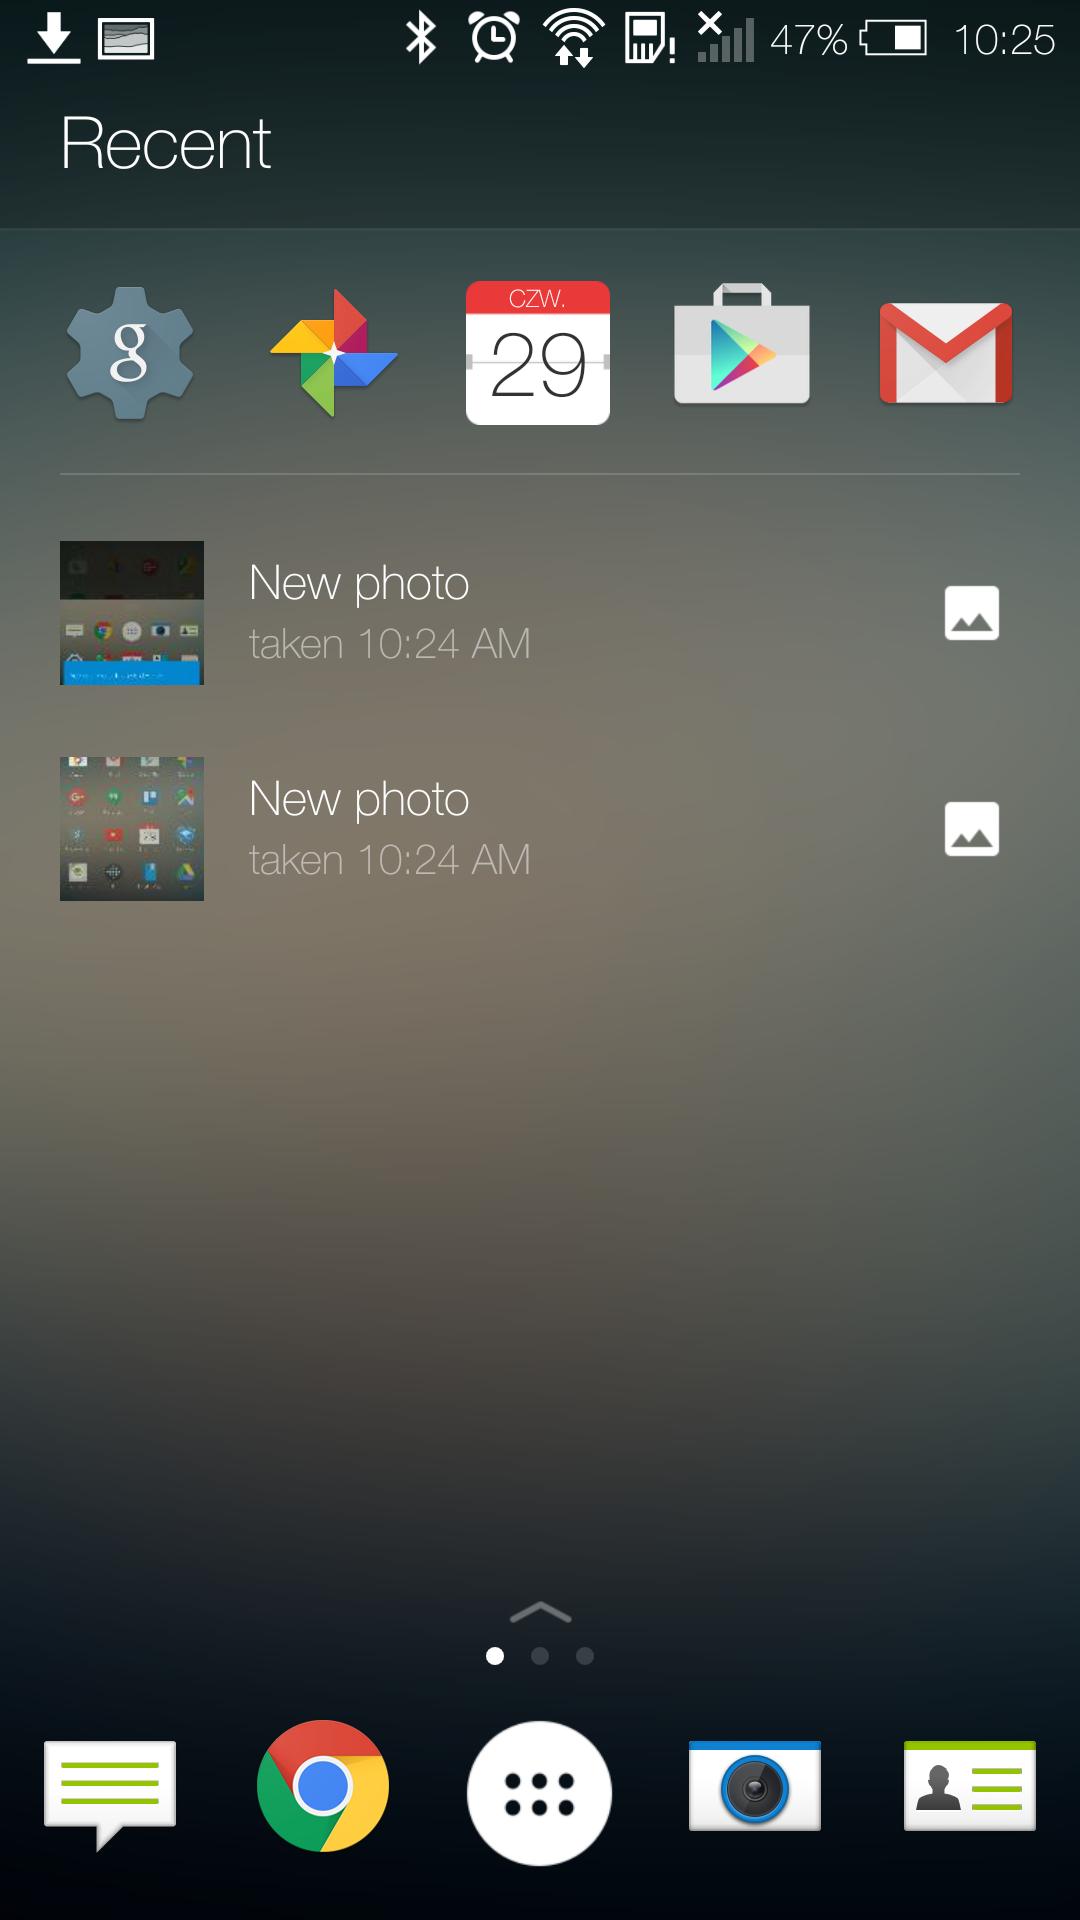 Screenshot_2015-10-29-10-25-42